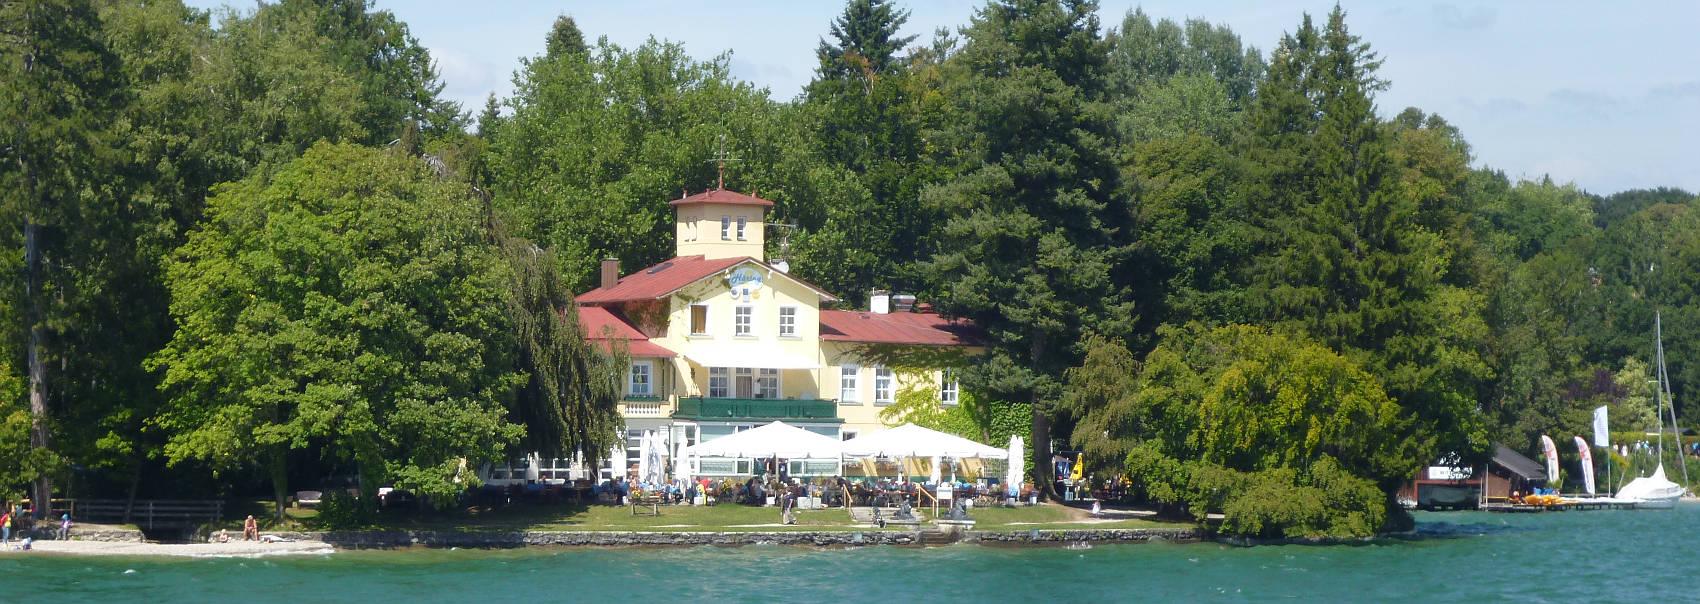 Starnberger See Hochzeit Oder Feier